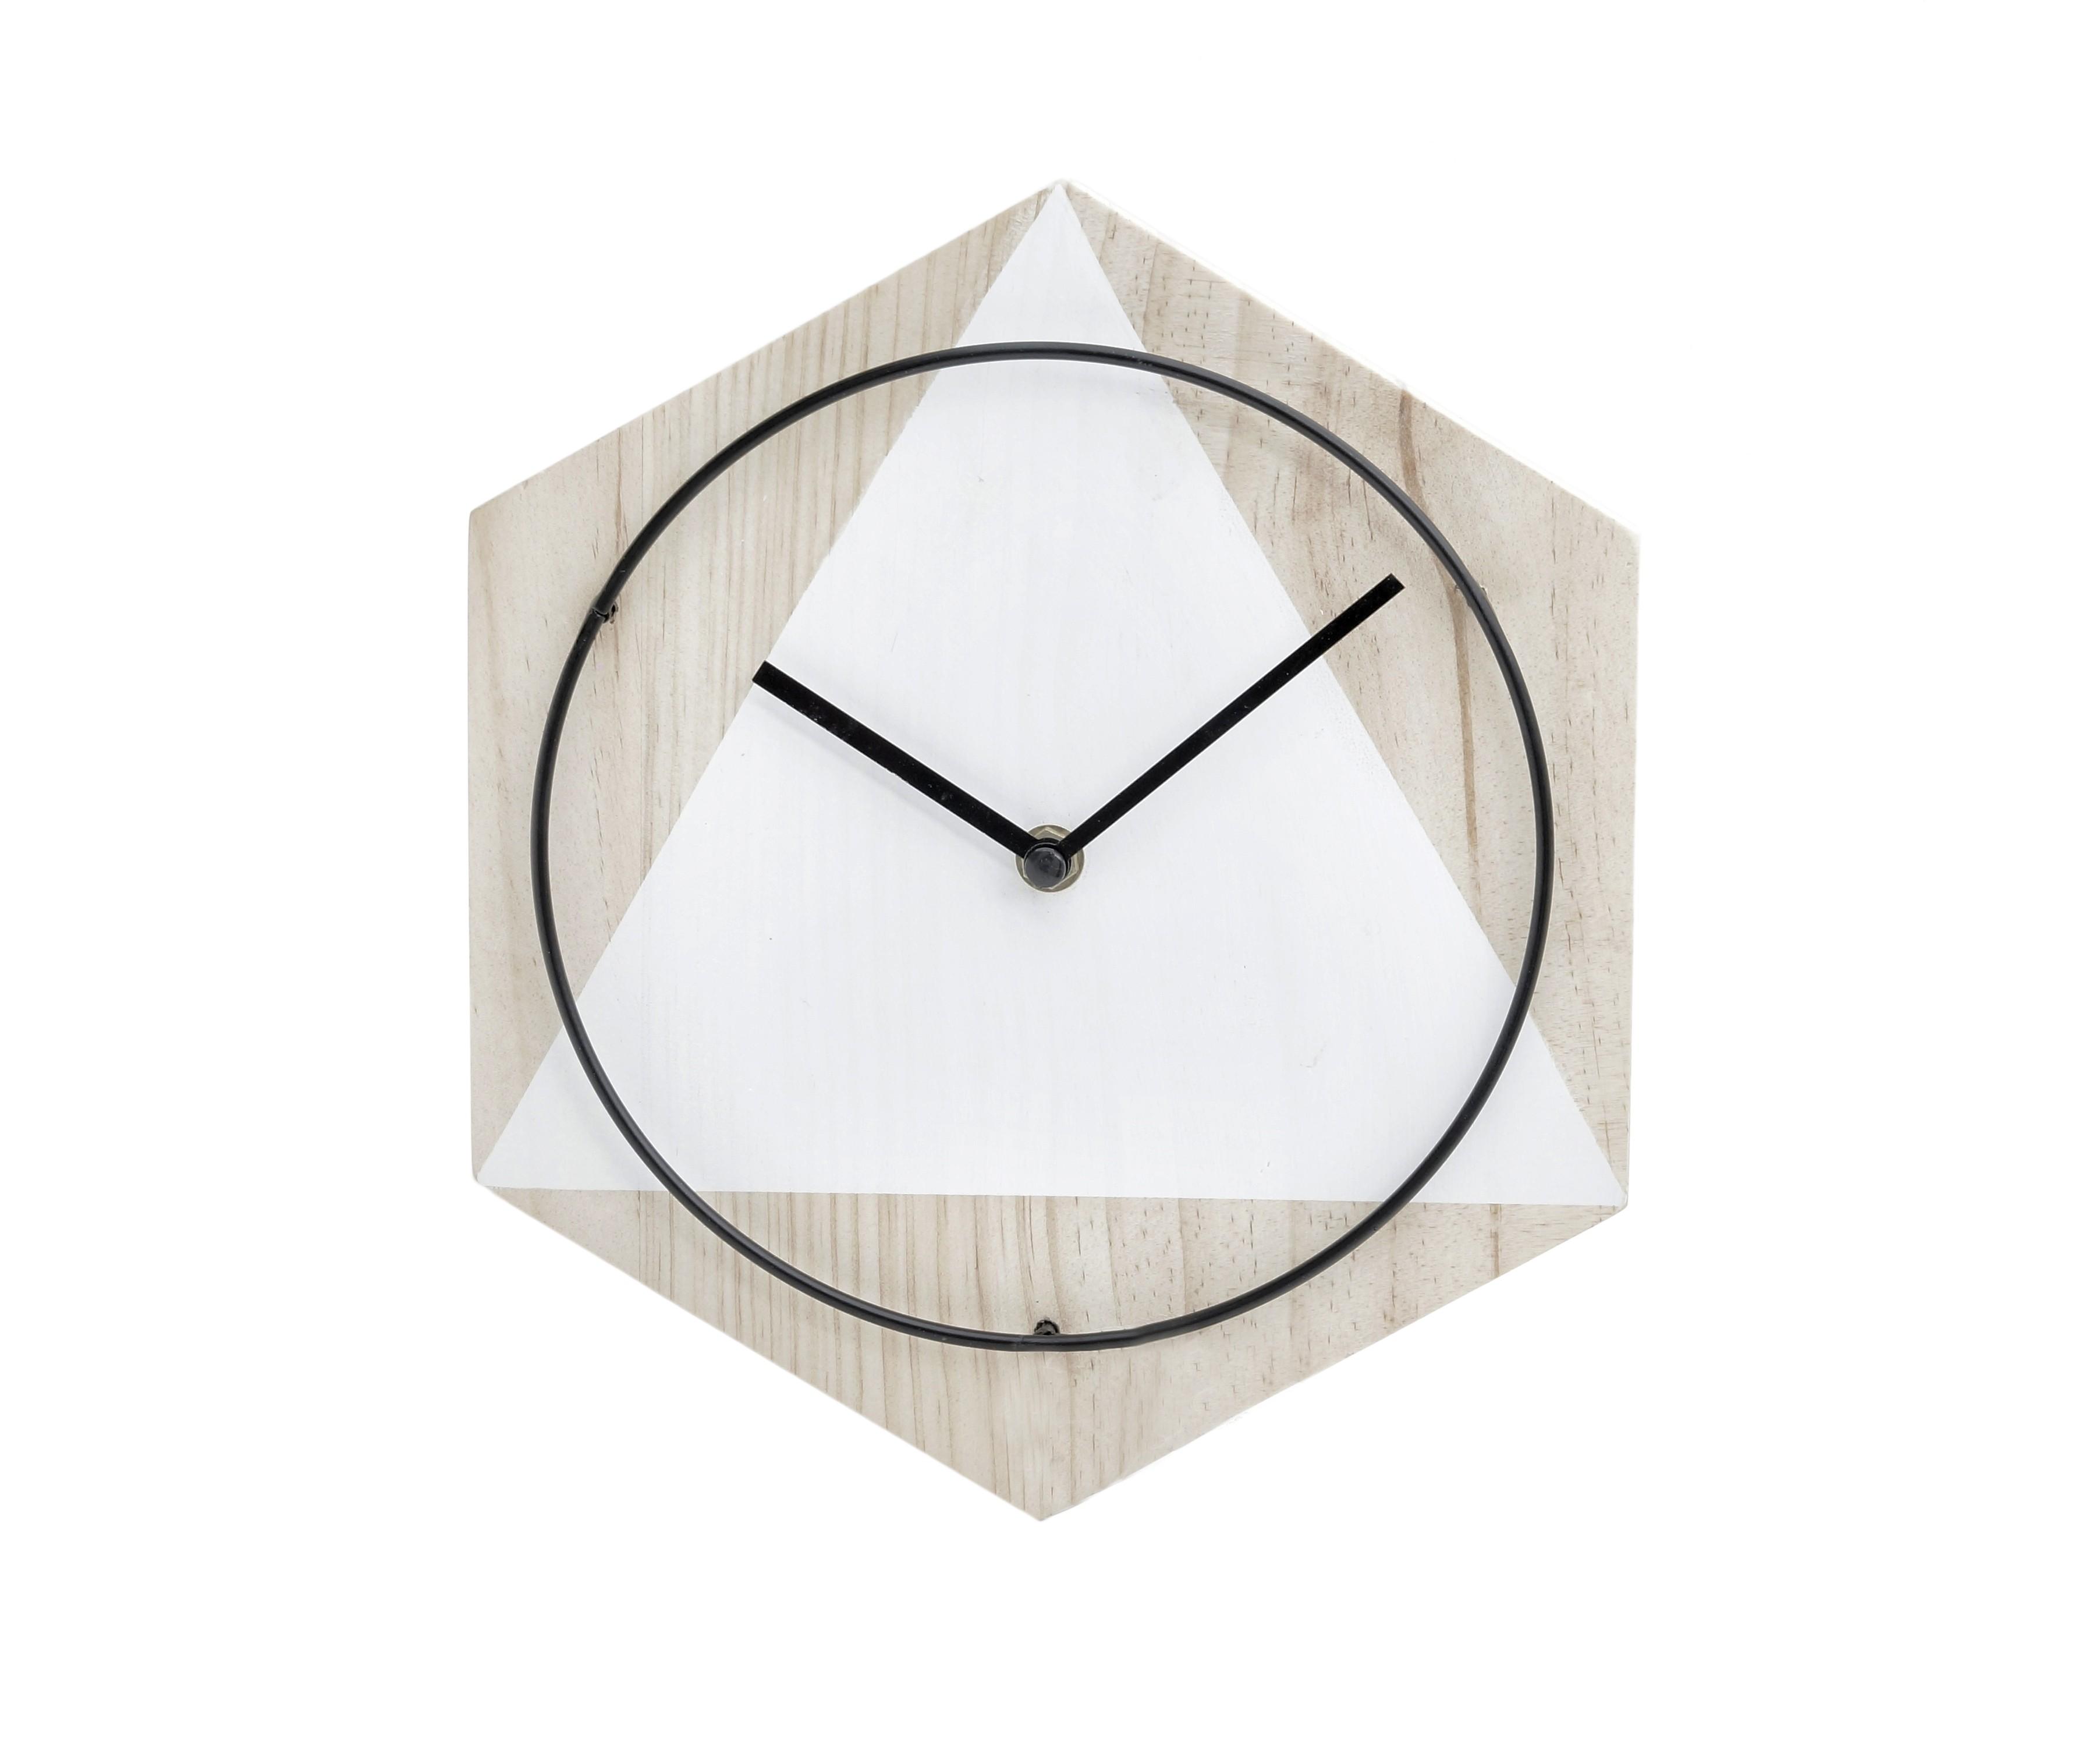 Часы настенные SundoНастенные часы<br>кварцевый механизм<br><br>Material: Дерево<br>Width см: 27<br>Depth см: 4<br>Height см: 23